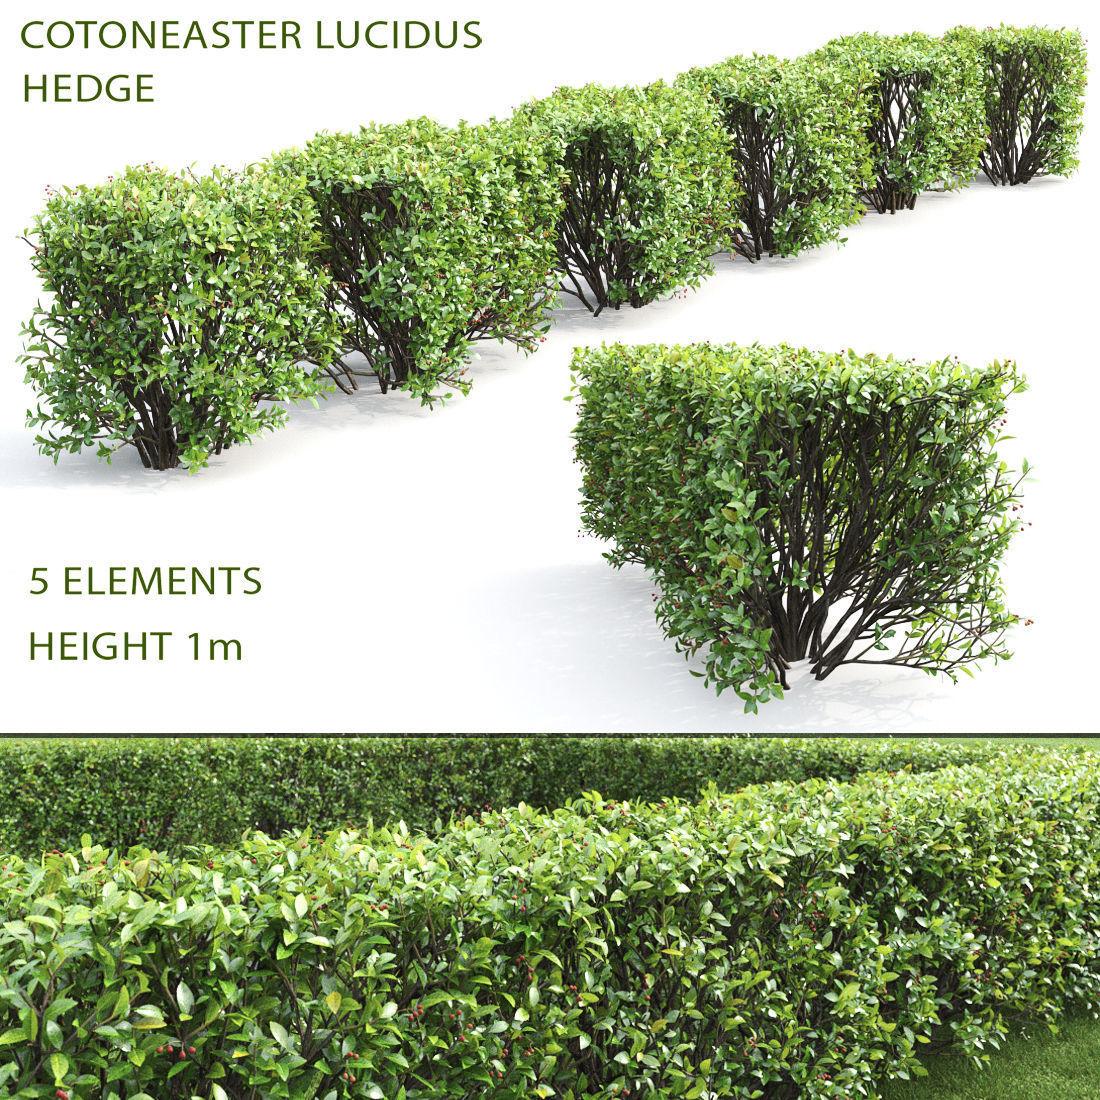 Cotoneaster lucidus hedge 04